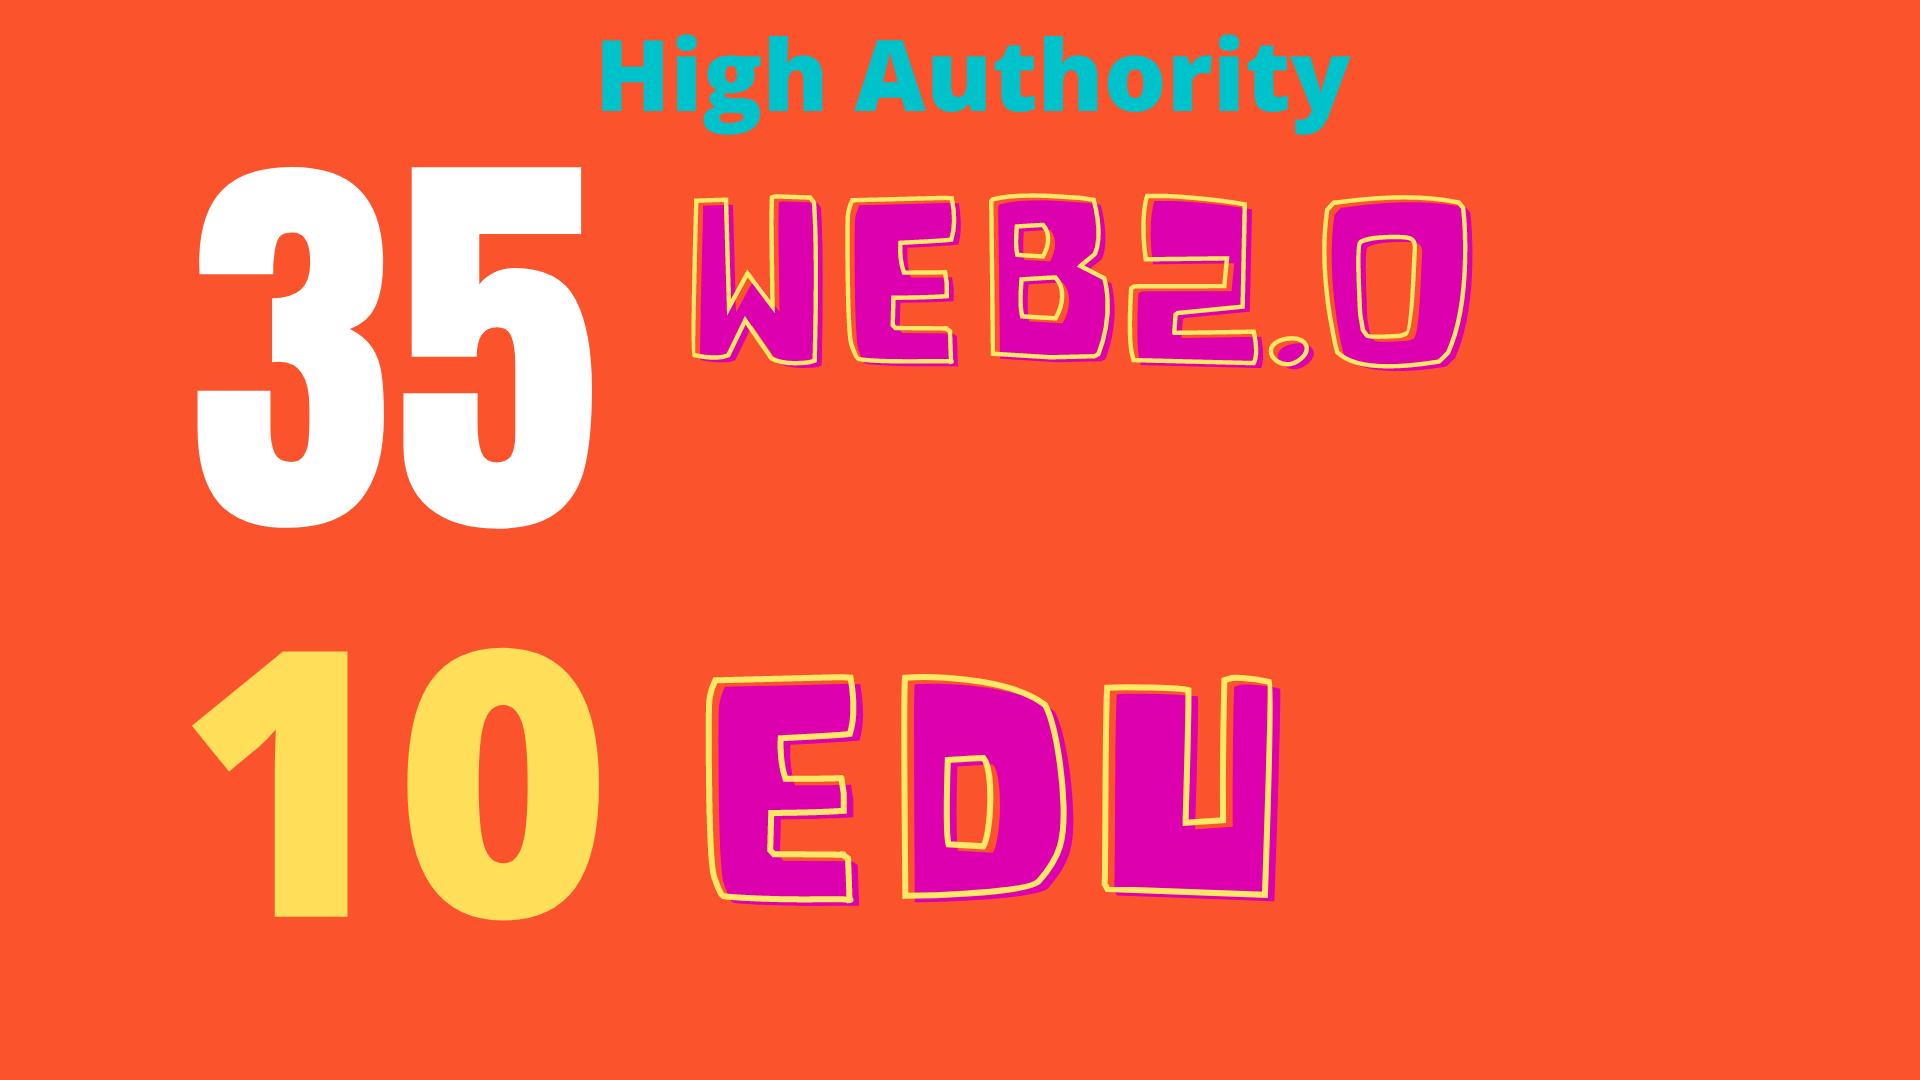 High Authority DA90+ Backlinks 35 web2.0 and 10 EDU/GOV TOP RANKING SEO